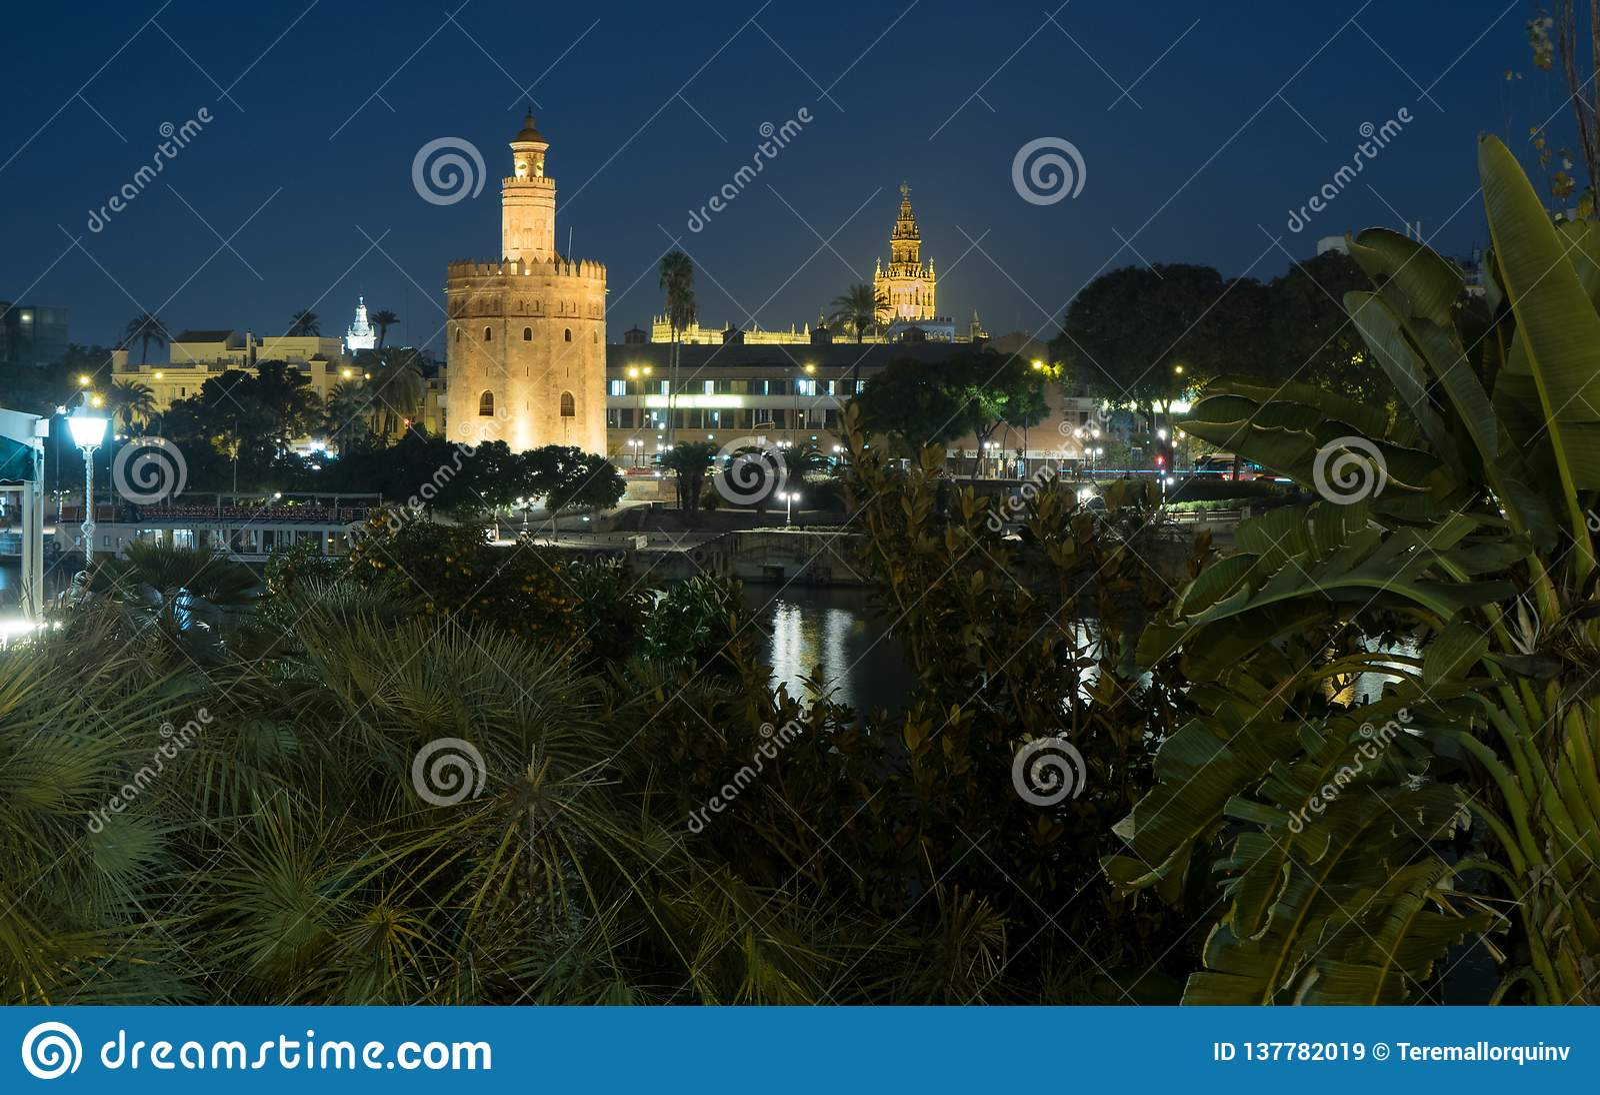 Torre del Oro and Cathedral of Seville - Torre del Oro y Catedral de Sevilla